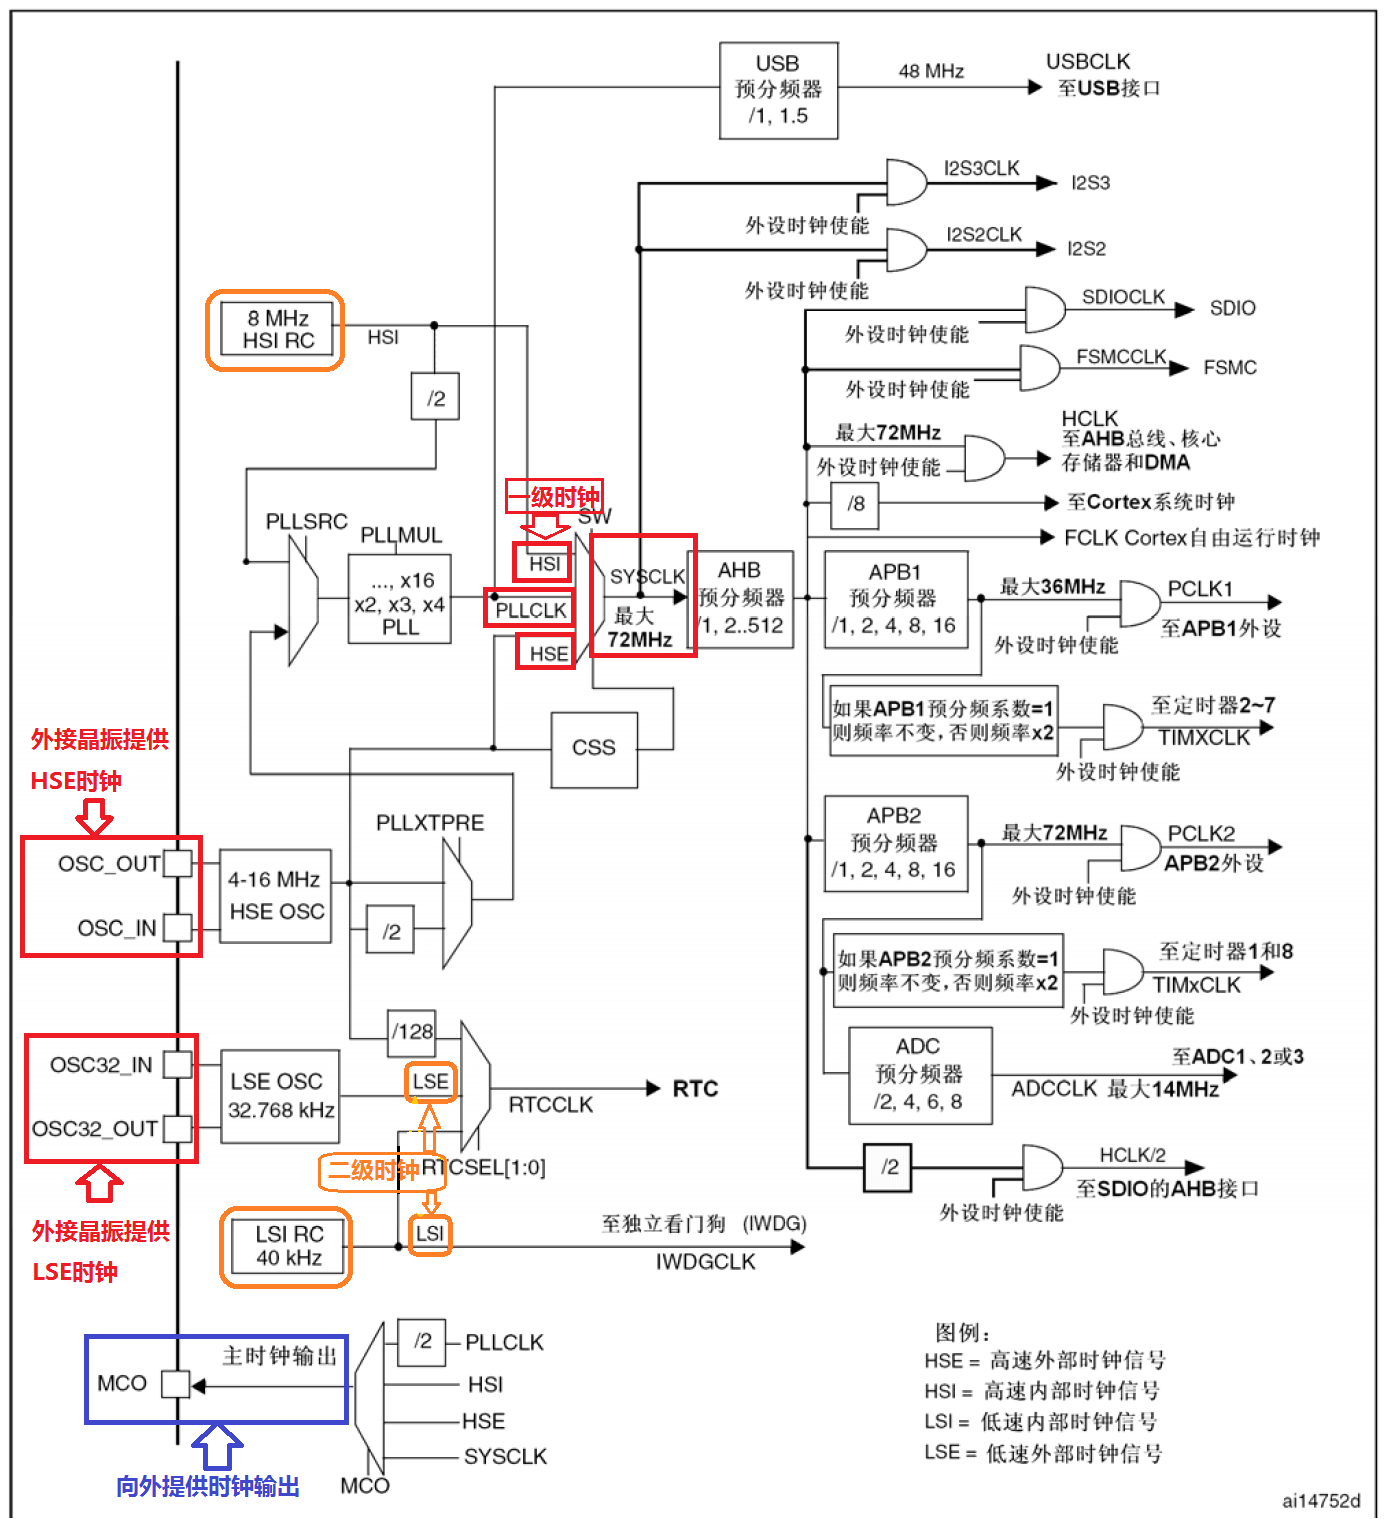 Cotex-M3内核STM32F10XX系列时钟及其配置方法